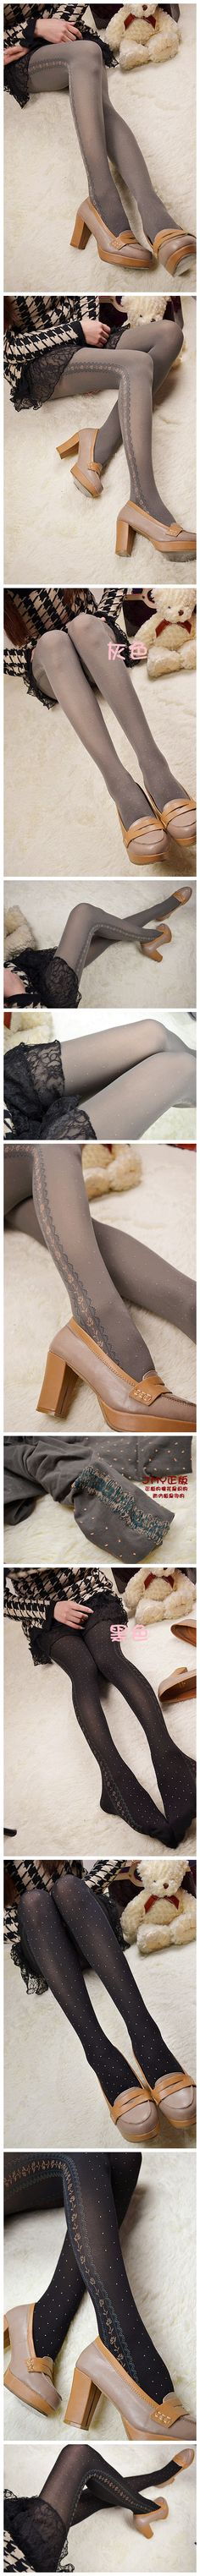 6d0c9a0364c5a early autumn winter Fashion sexy vintage sidepiece flower polka dot  pantyhose velvet grey leggings 711810 PL12061203